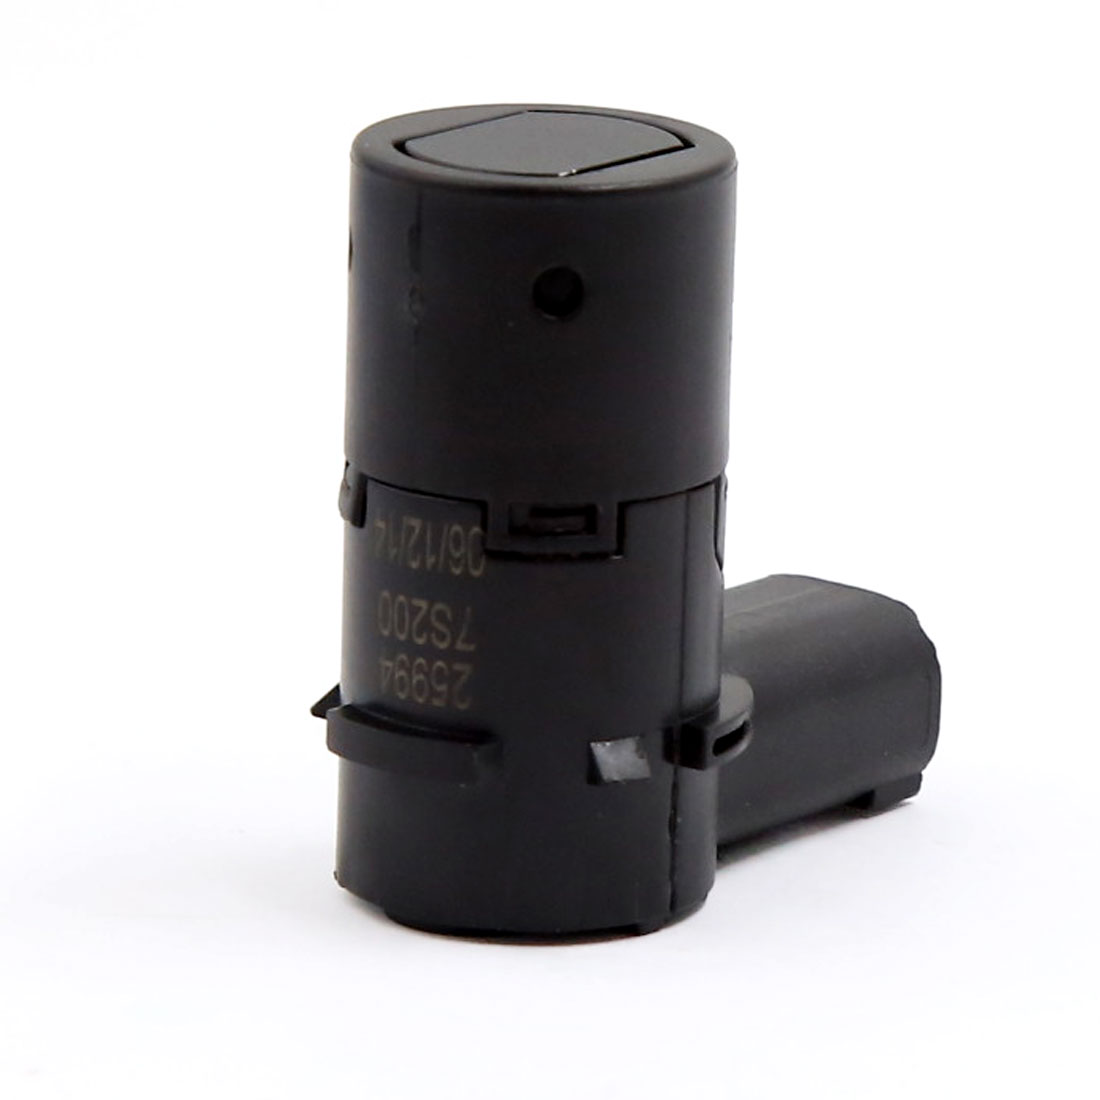 Rear PDC Assist Parking Sensor 25994-7S200 for 2003-2004 Nissan Armada Titan